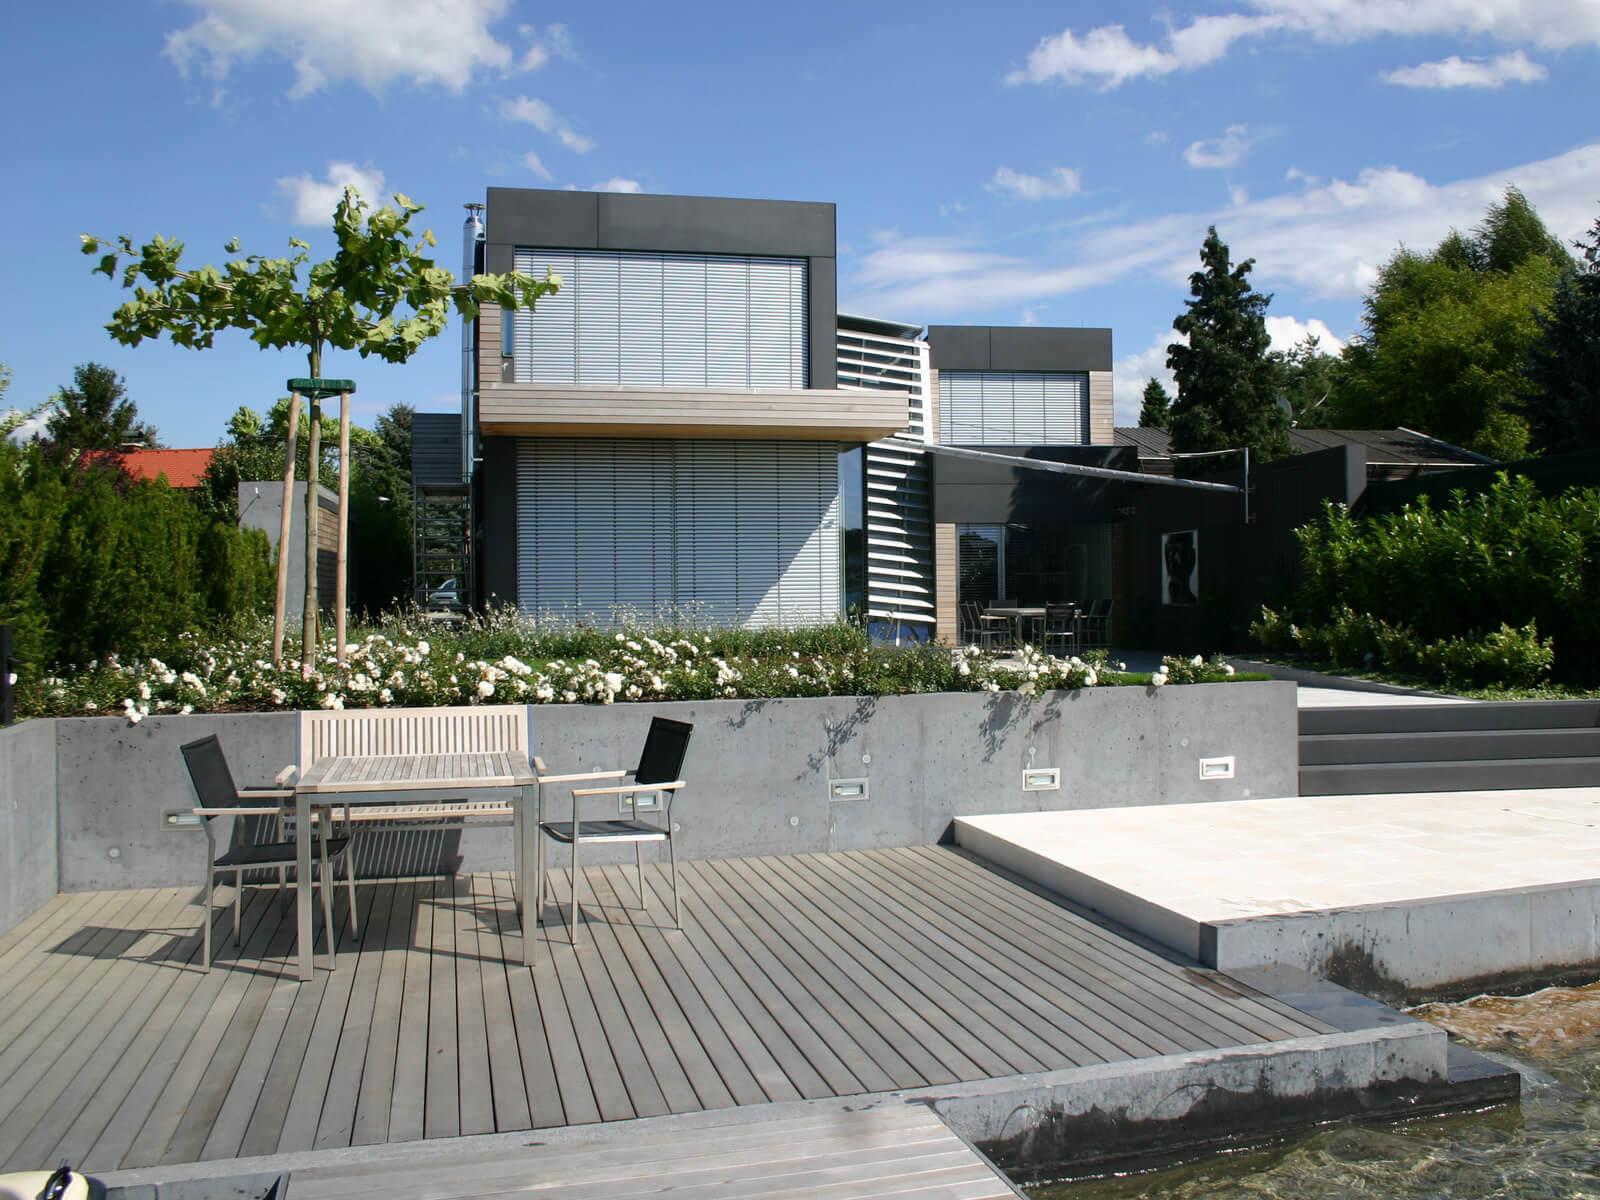 terrassen aus zedernholz unbehandelt. Black Bedroom Furniture Sets. Home Design Ideas